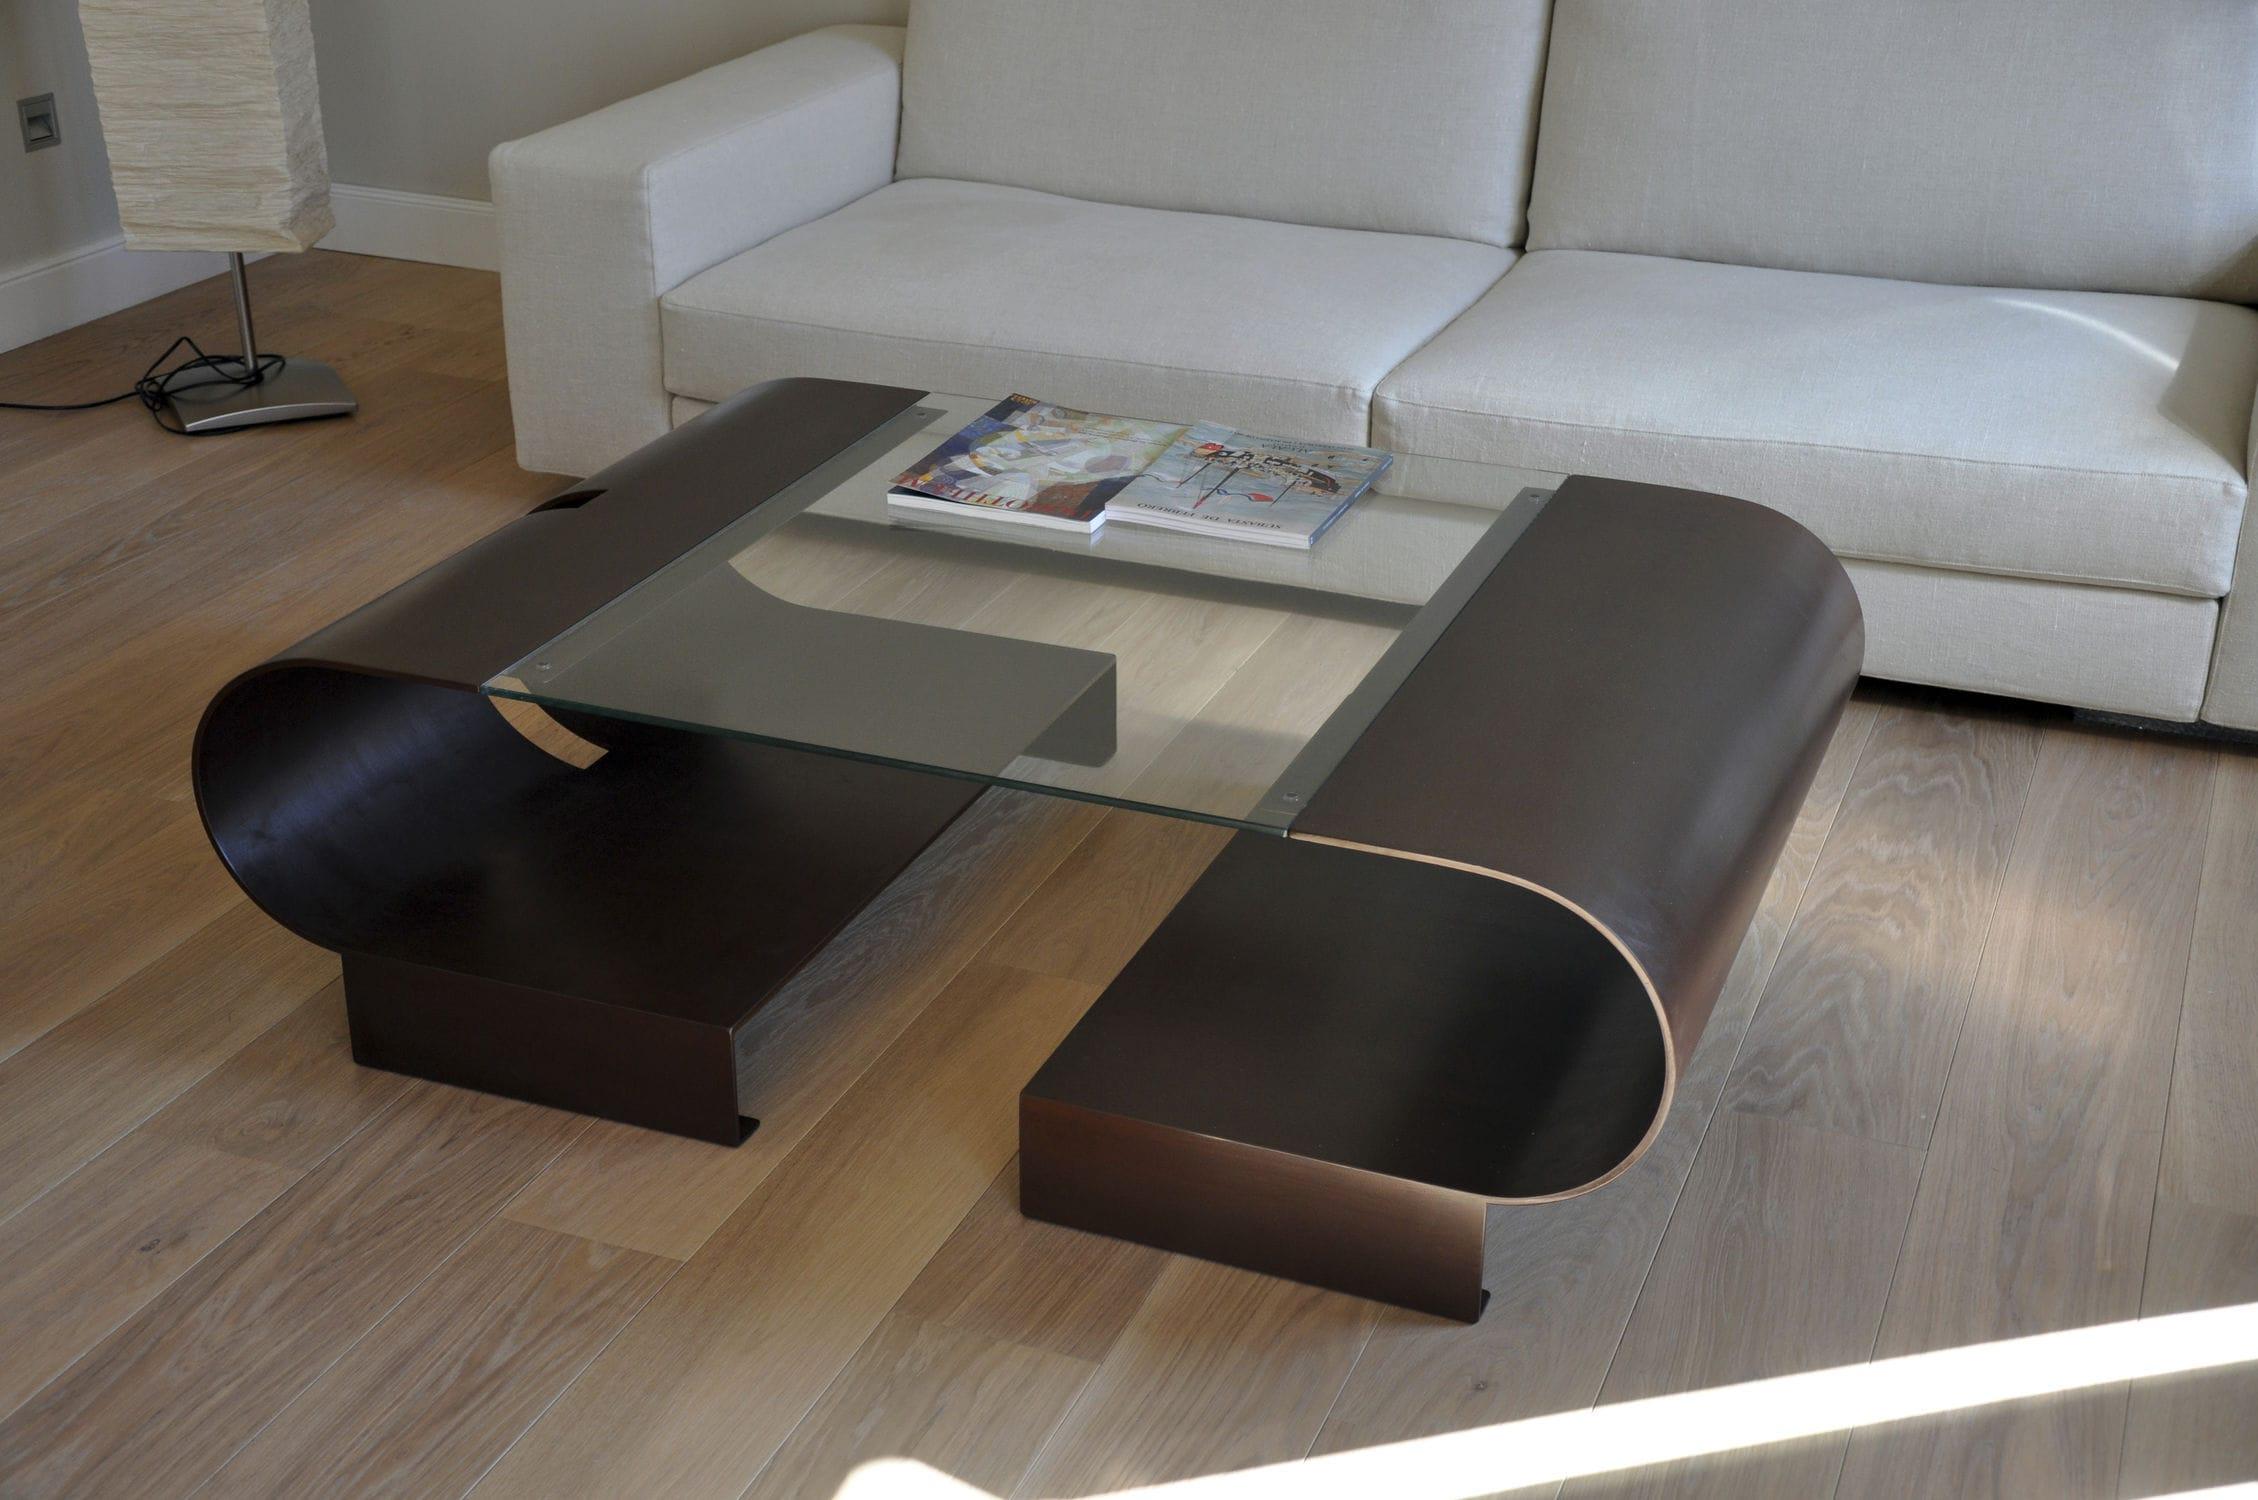 ... Contemporary Coffee Table / Glass / Rectangular ELVA GONZALO DE SALAS Pictures